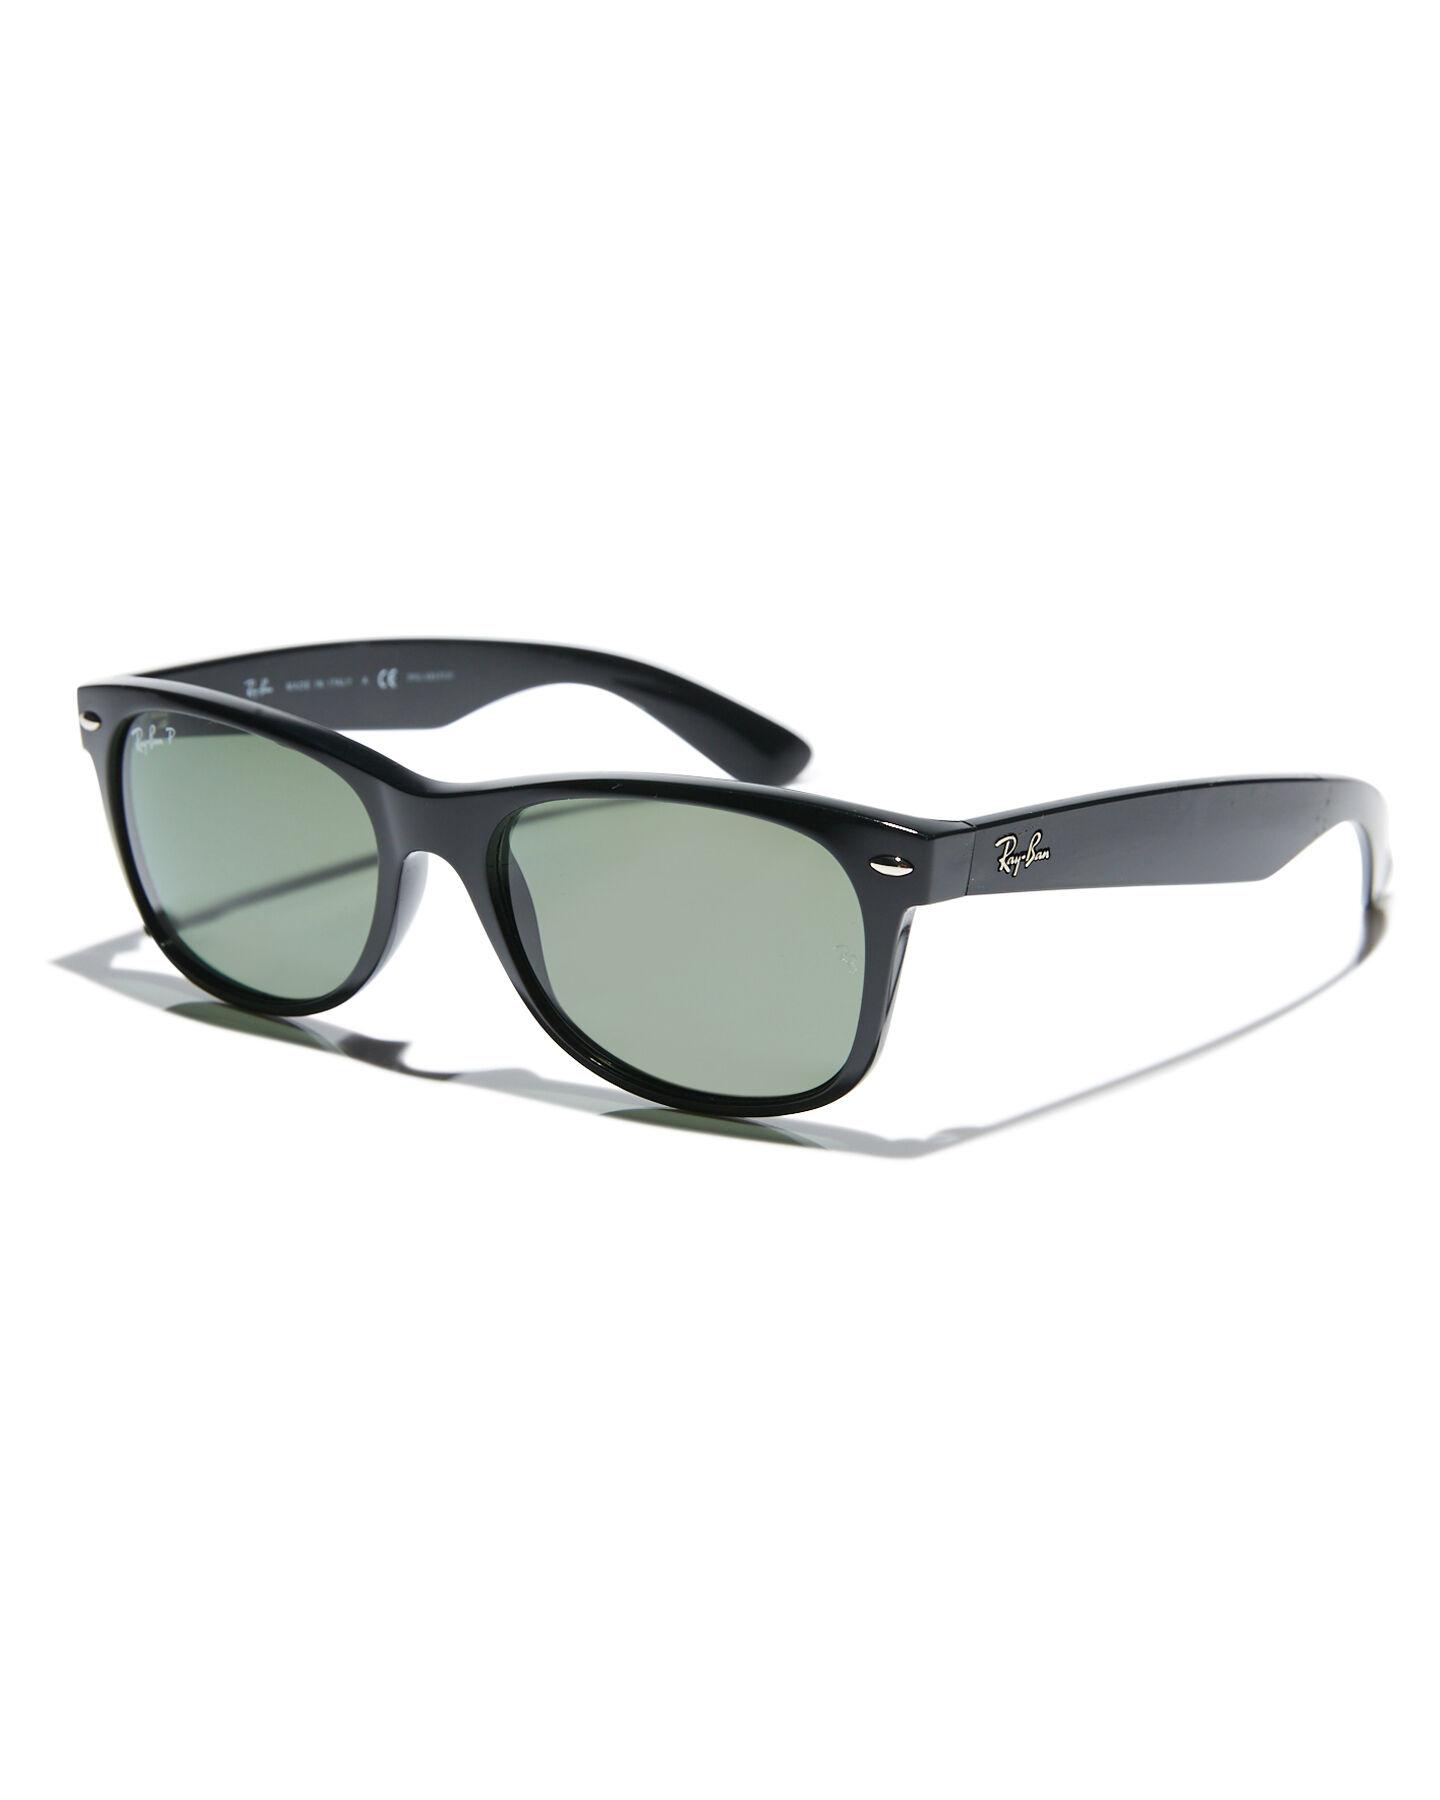 fac787125e8 coupon code ray ban clubmaster glasses vision express york c2295 9367f